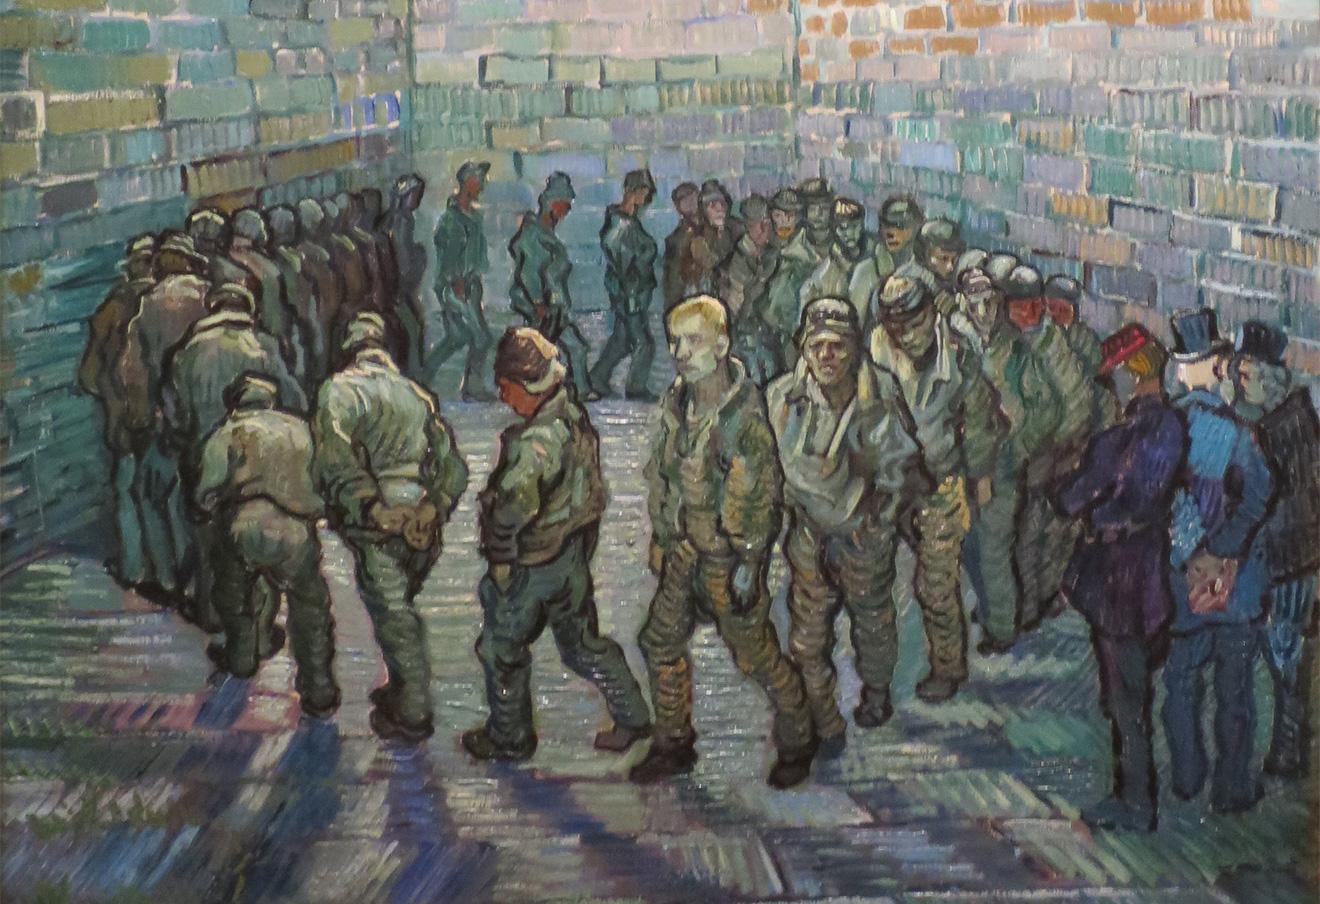 Винсент ван Гог. Прогулка заключенных. 1890